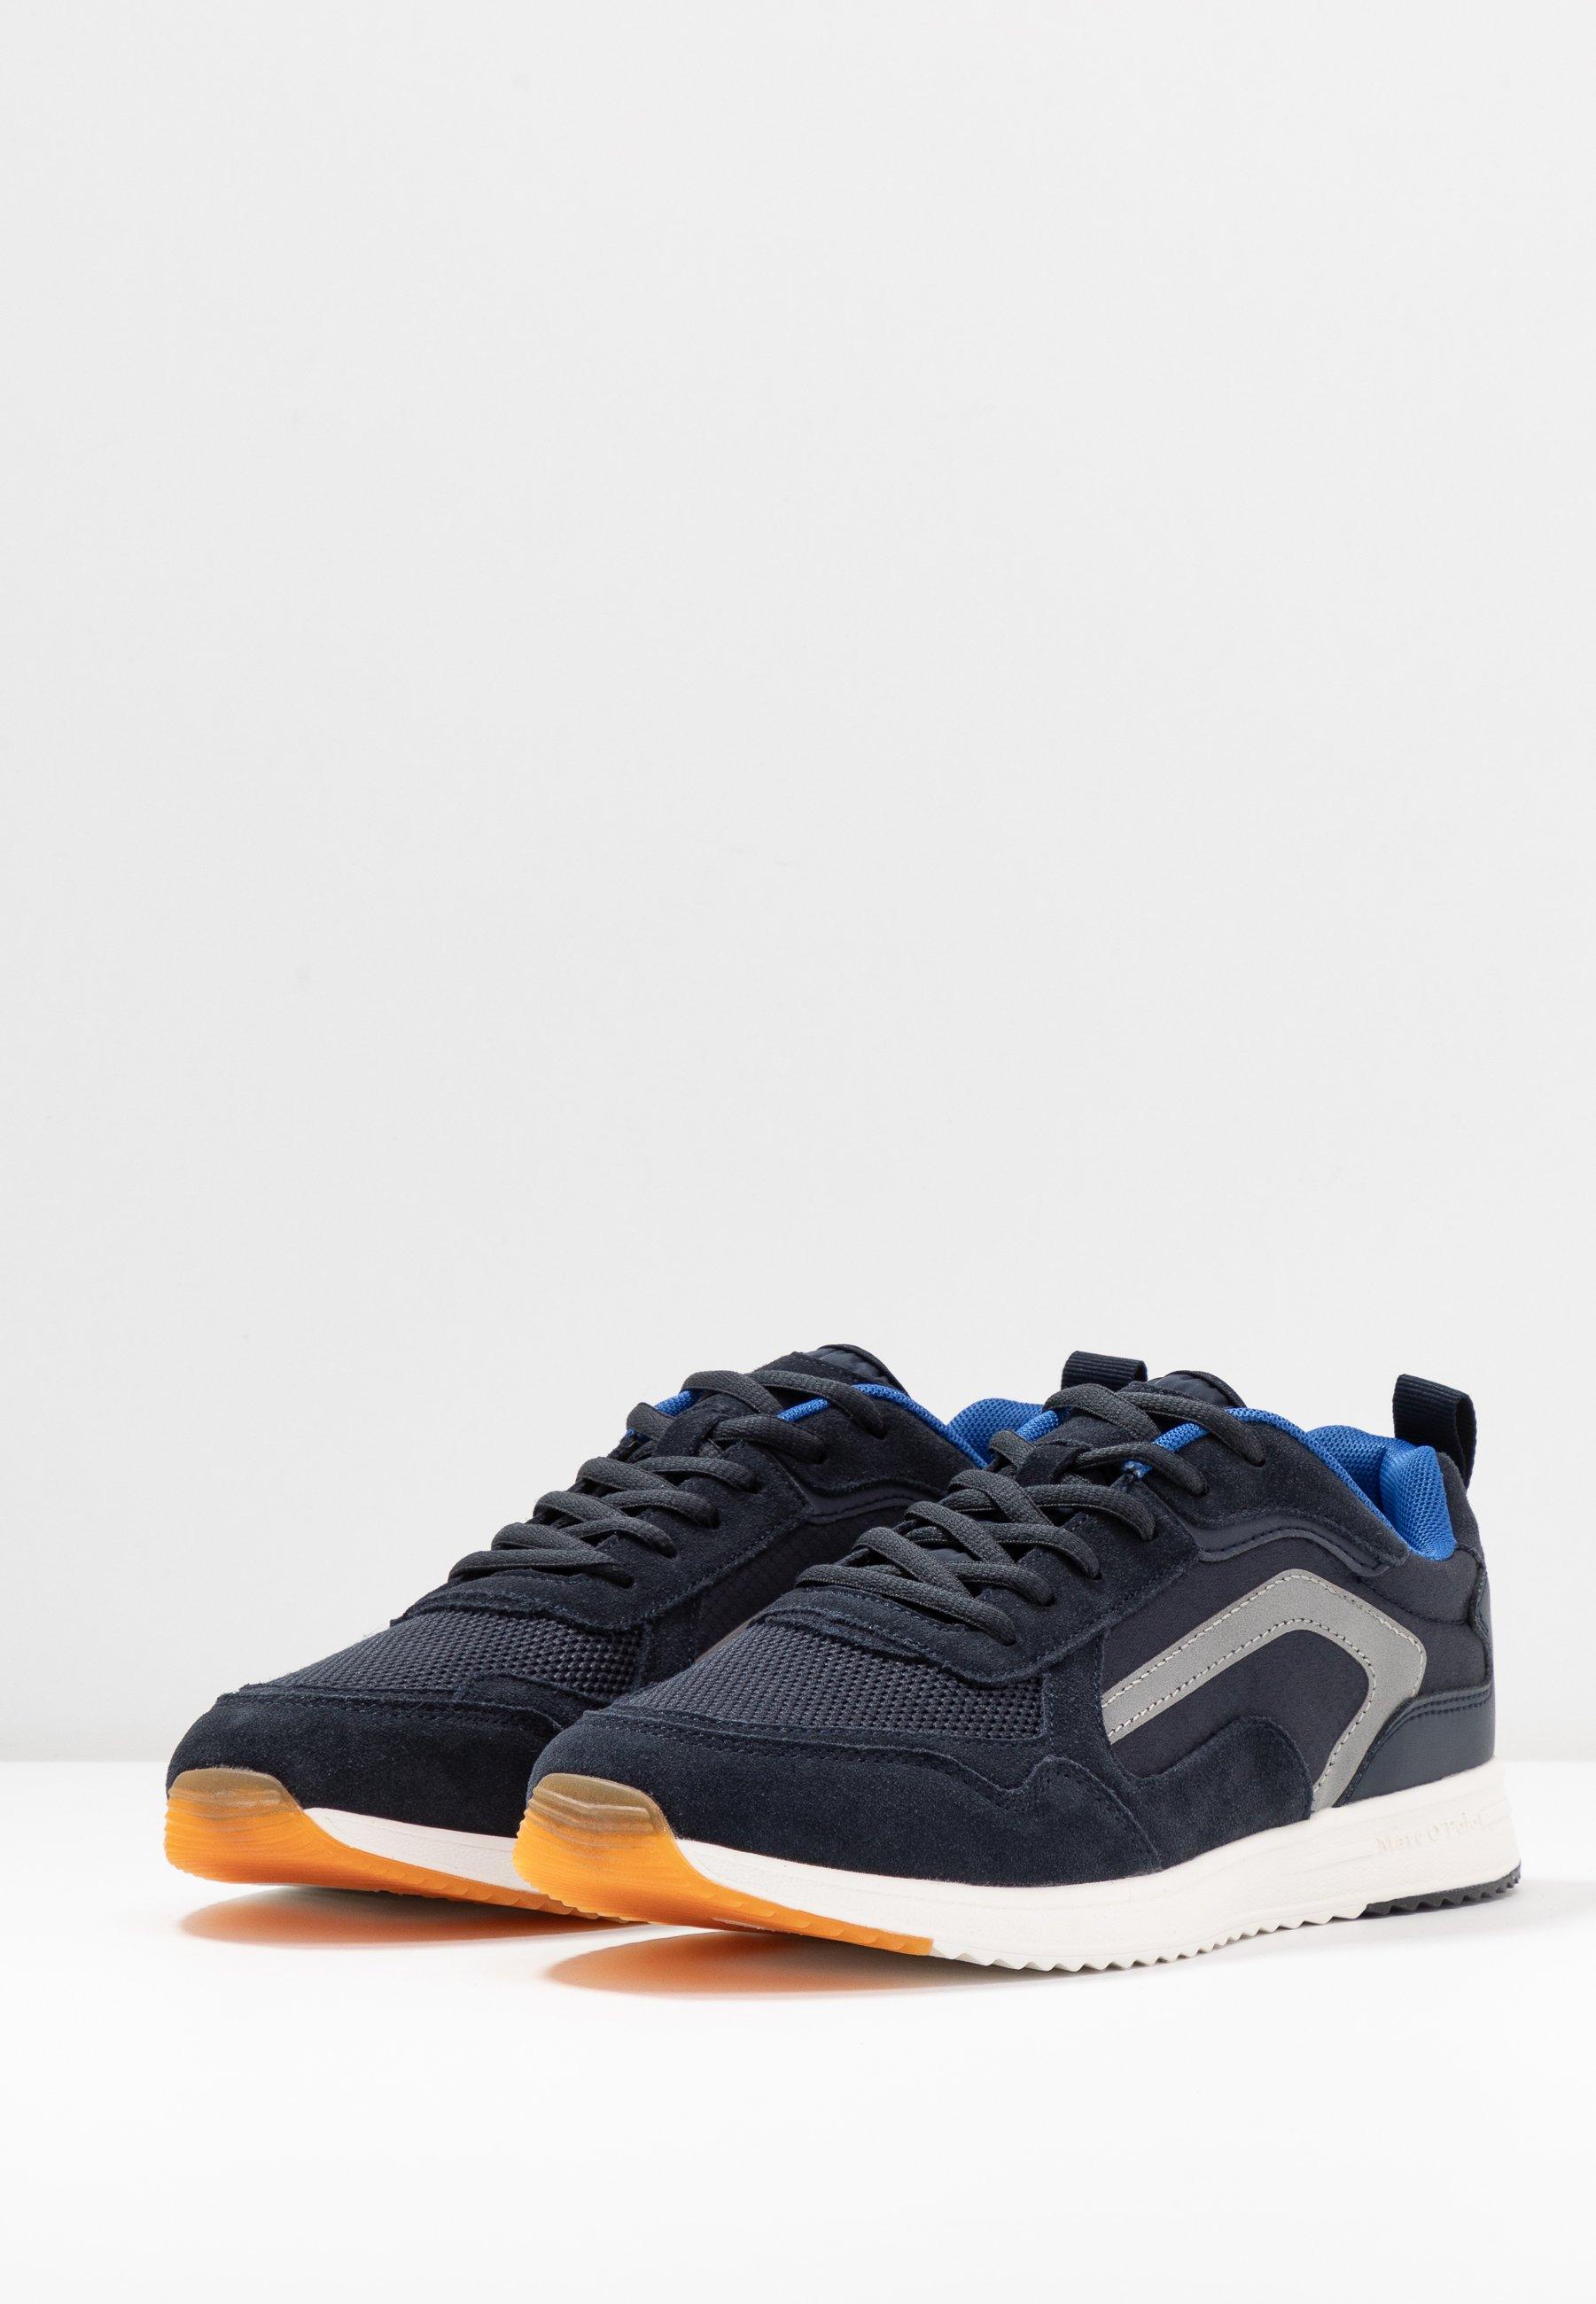 Marc O'polo Jasper - Sneakers Navy